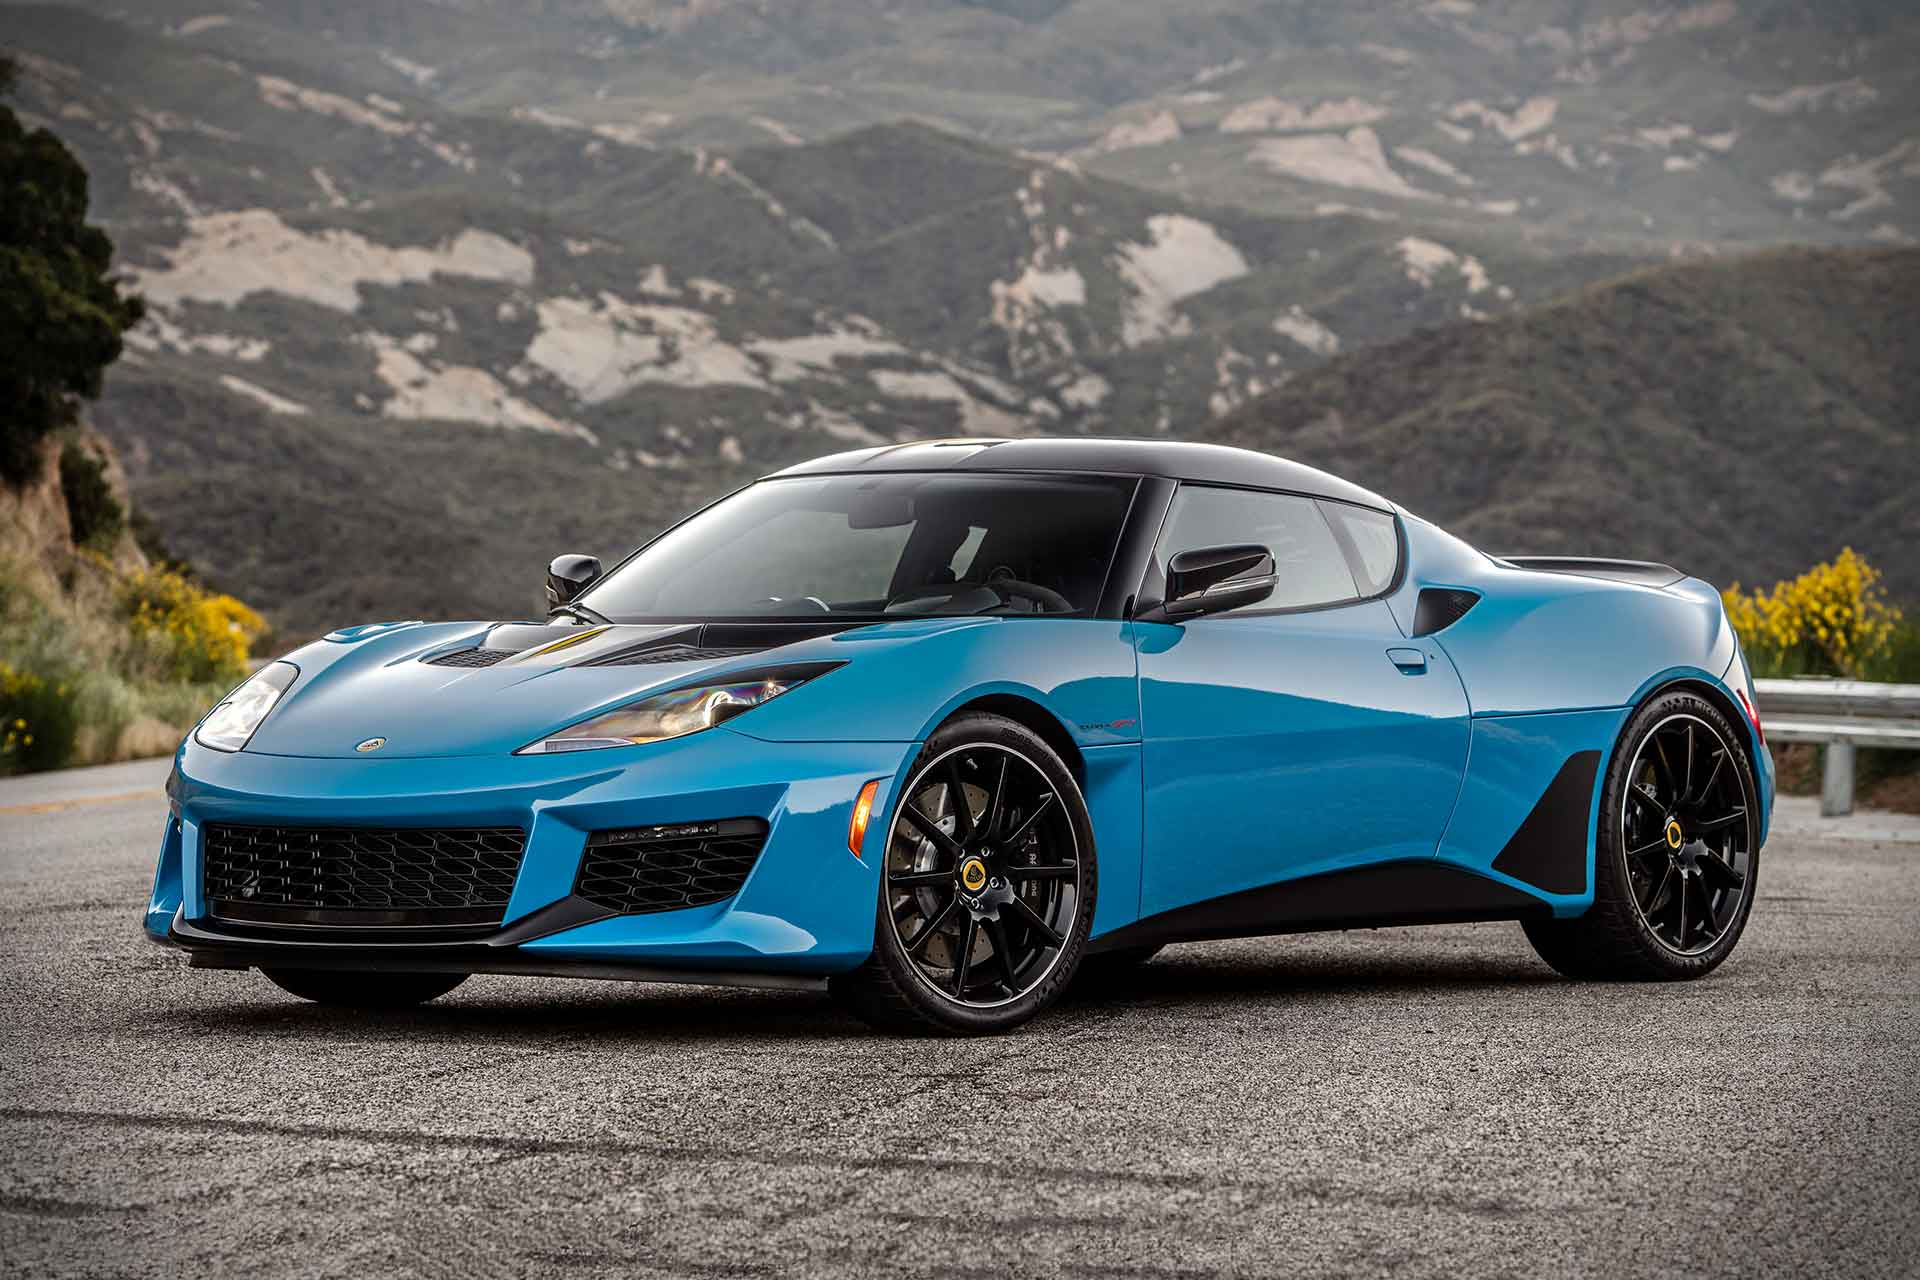 2020 Lotus Evora GT Coupe